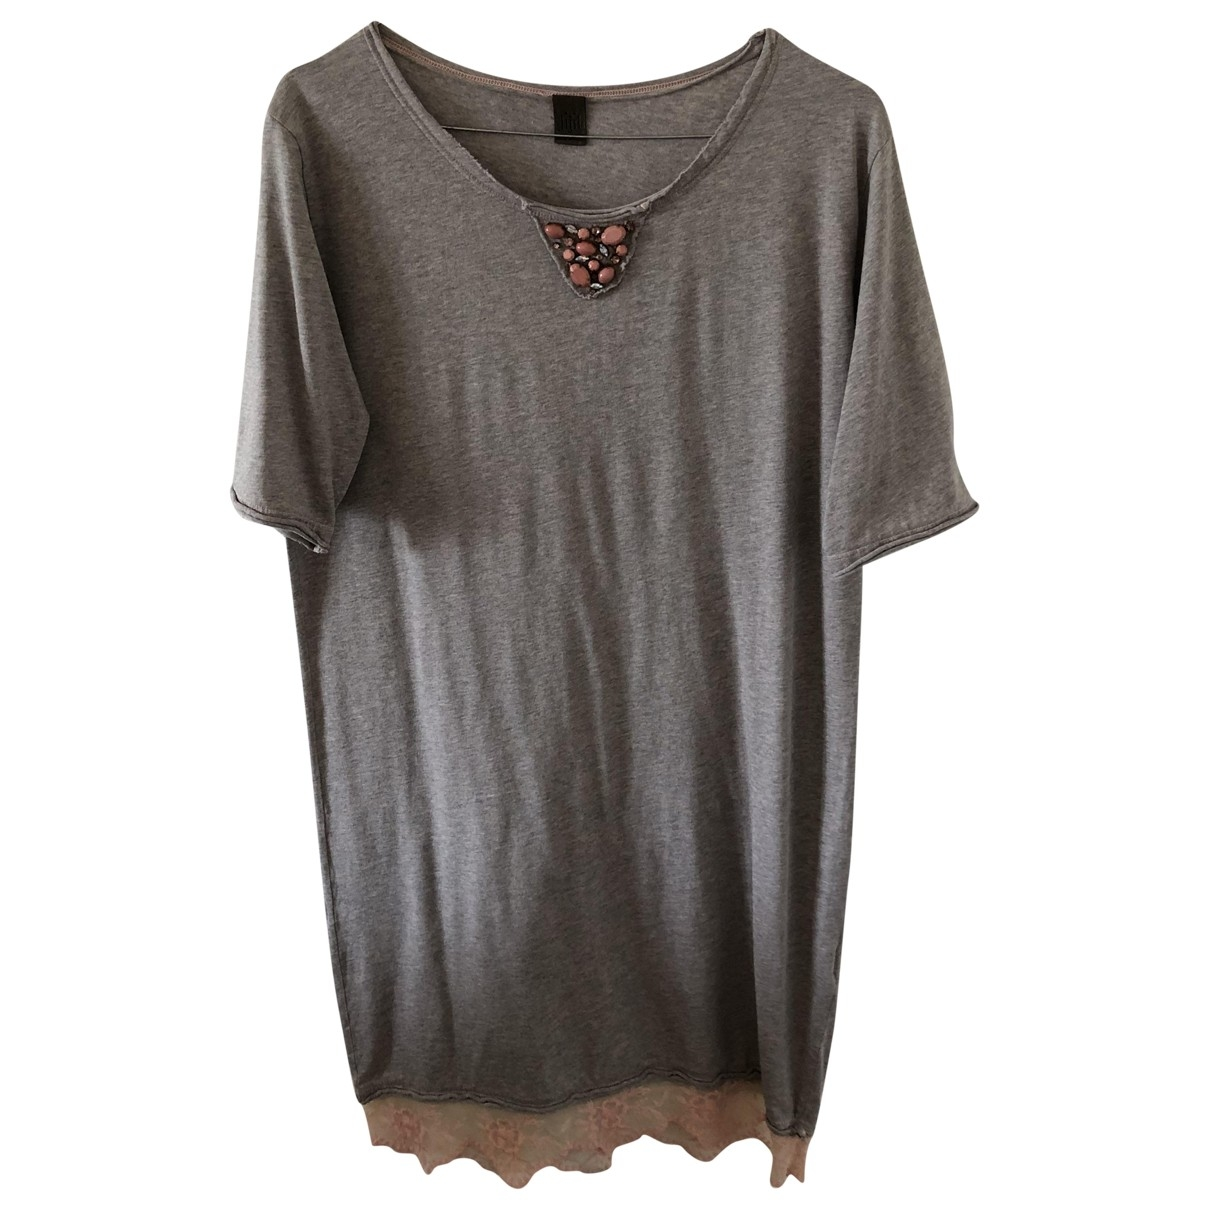 Jijil \N Grey Cotton dress for Women S International